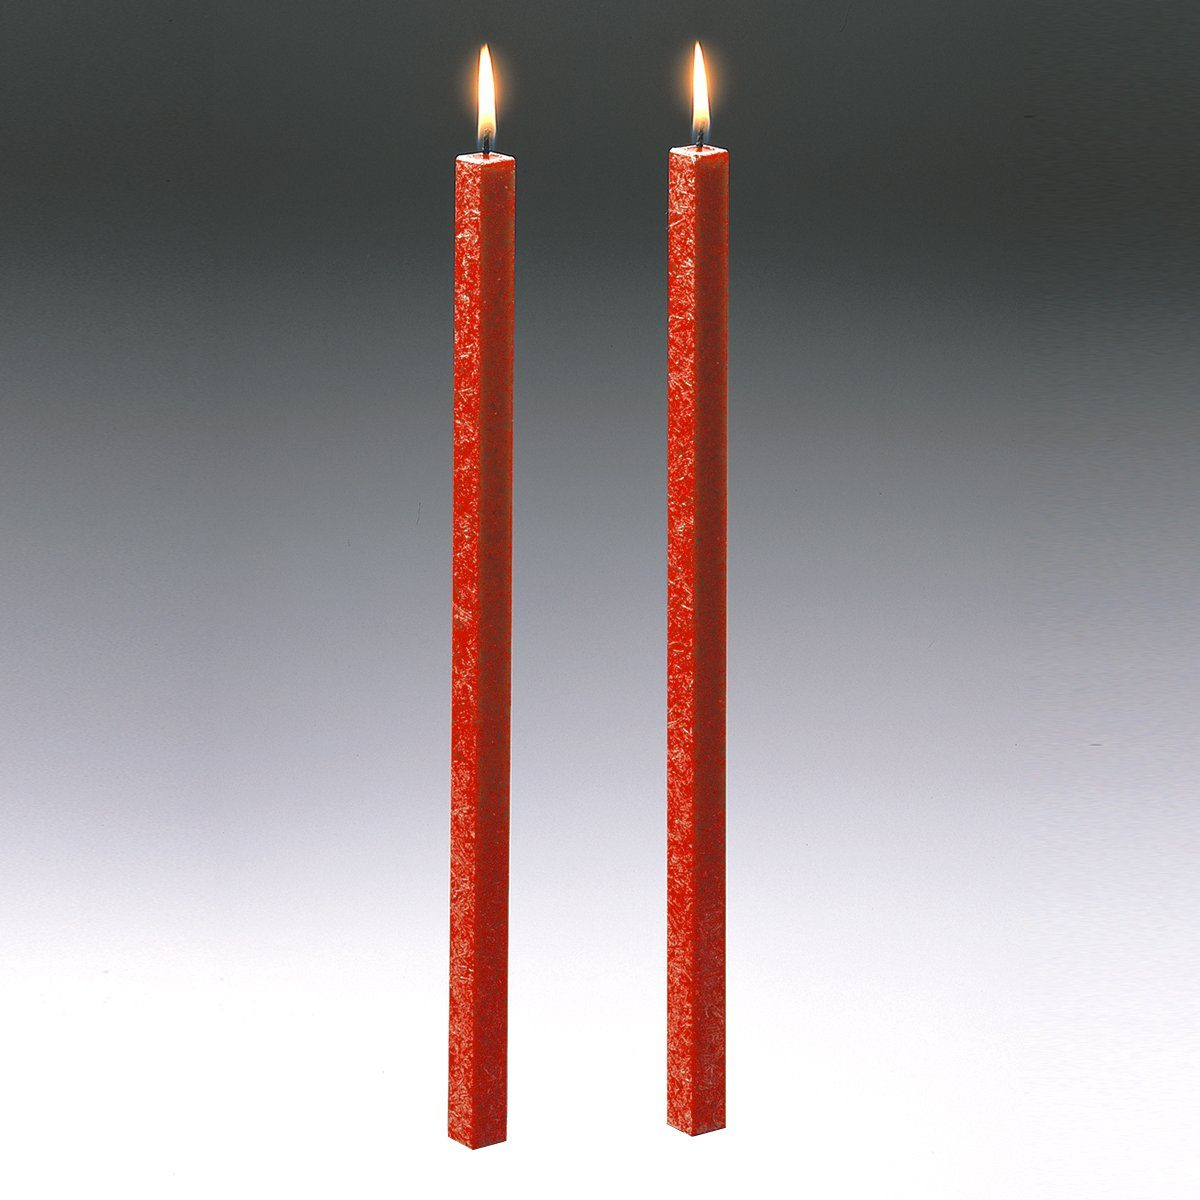 Amabiente Amabiente Kerze CLASSIC koralle 40cm - 2er Set